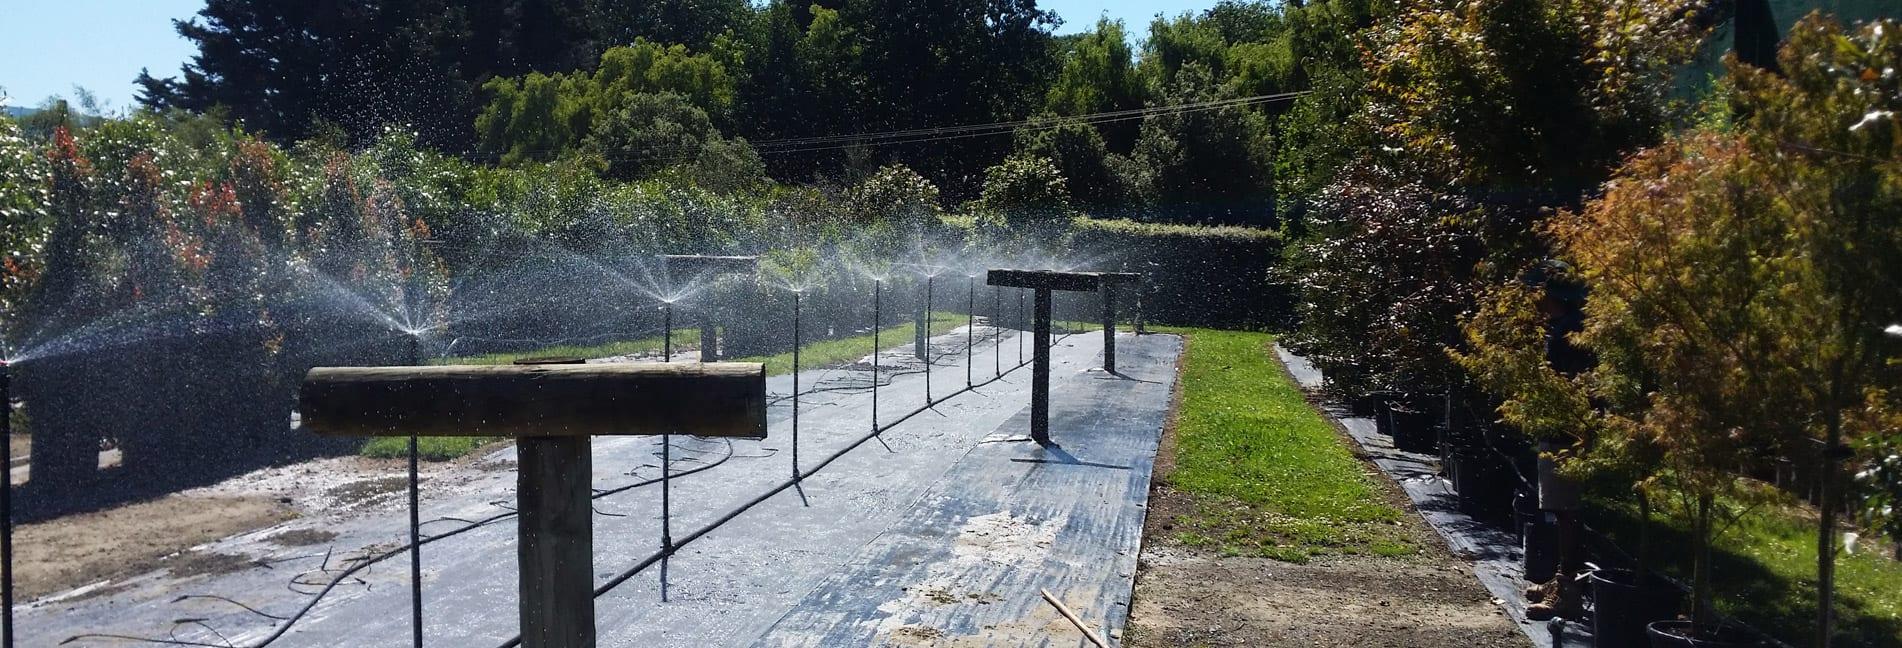 Garden irrigation systems New Zealand